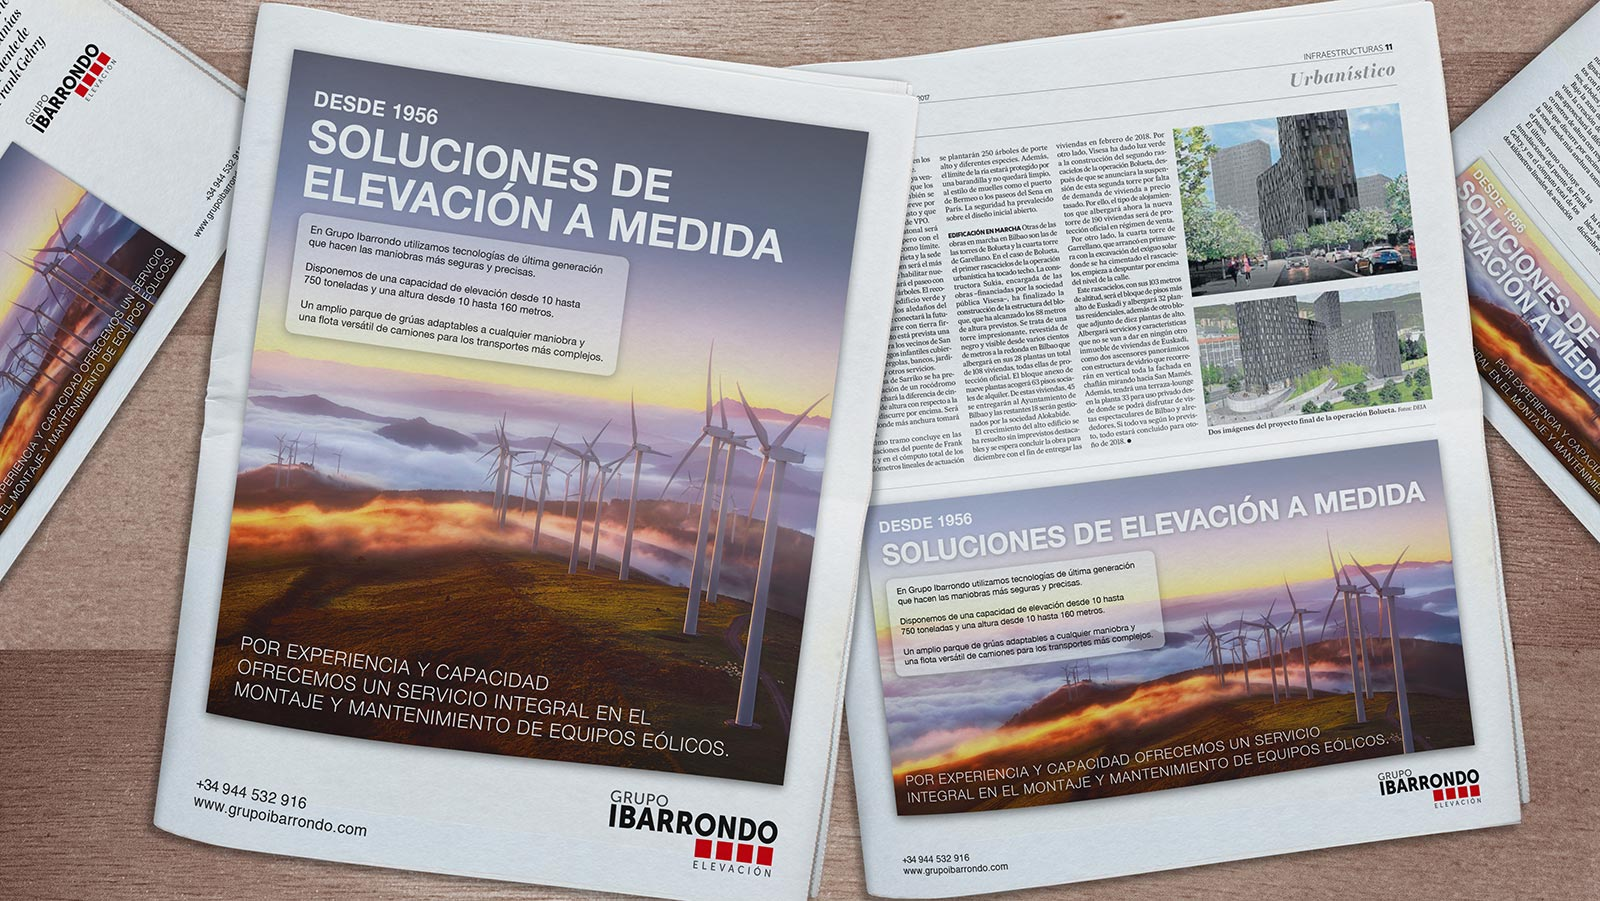 motiva-agencia-comunicacion_diseno-grafico_original-prensa_ibarrondo-2018